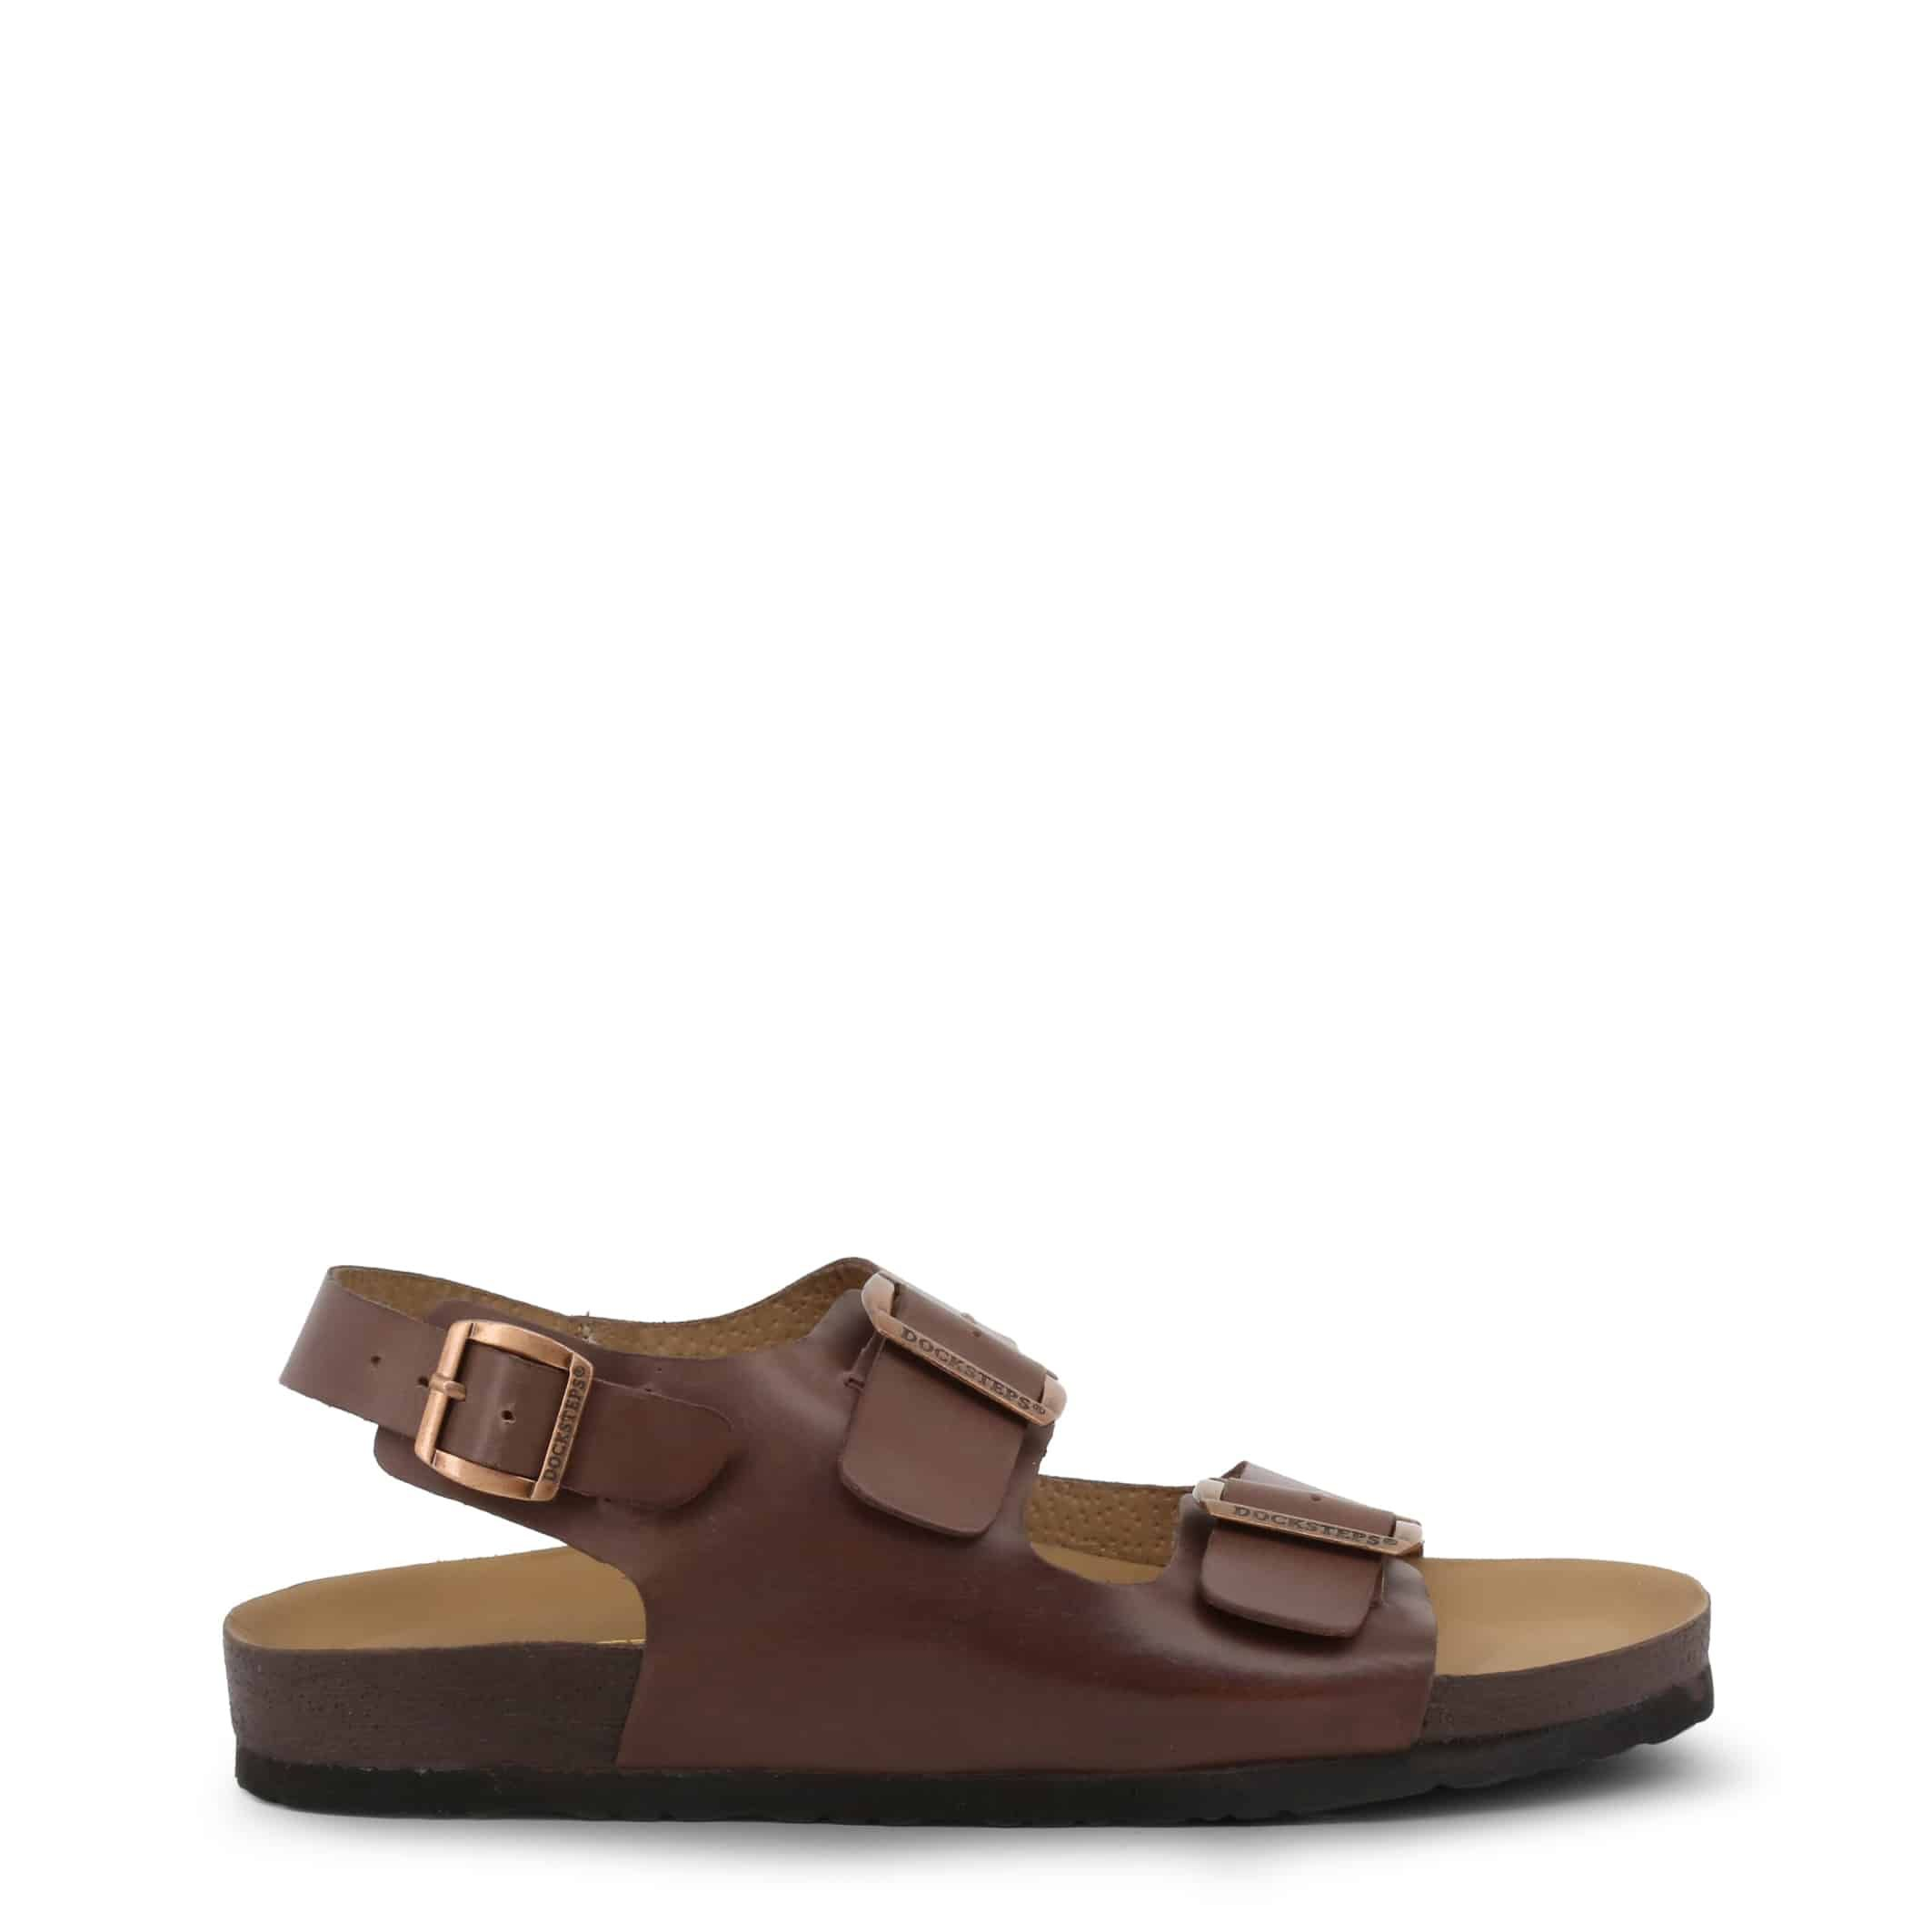 Schuhe Prada – 2OG064 – Schwarz